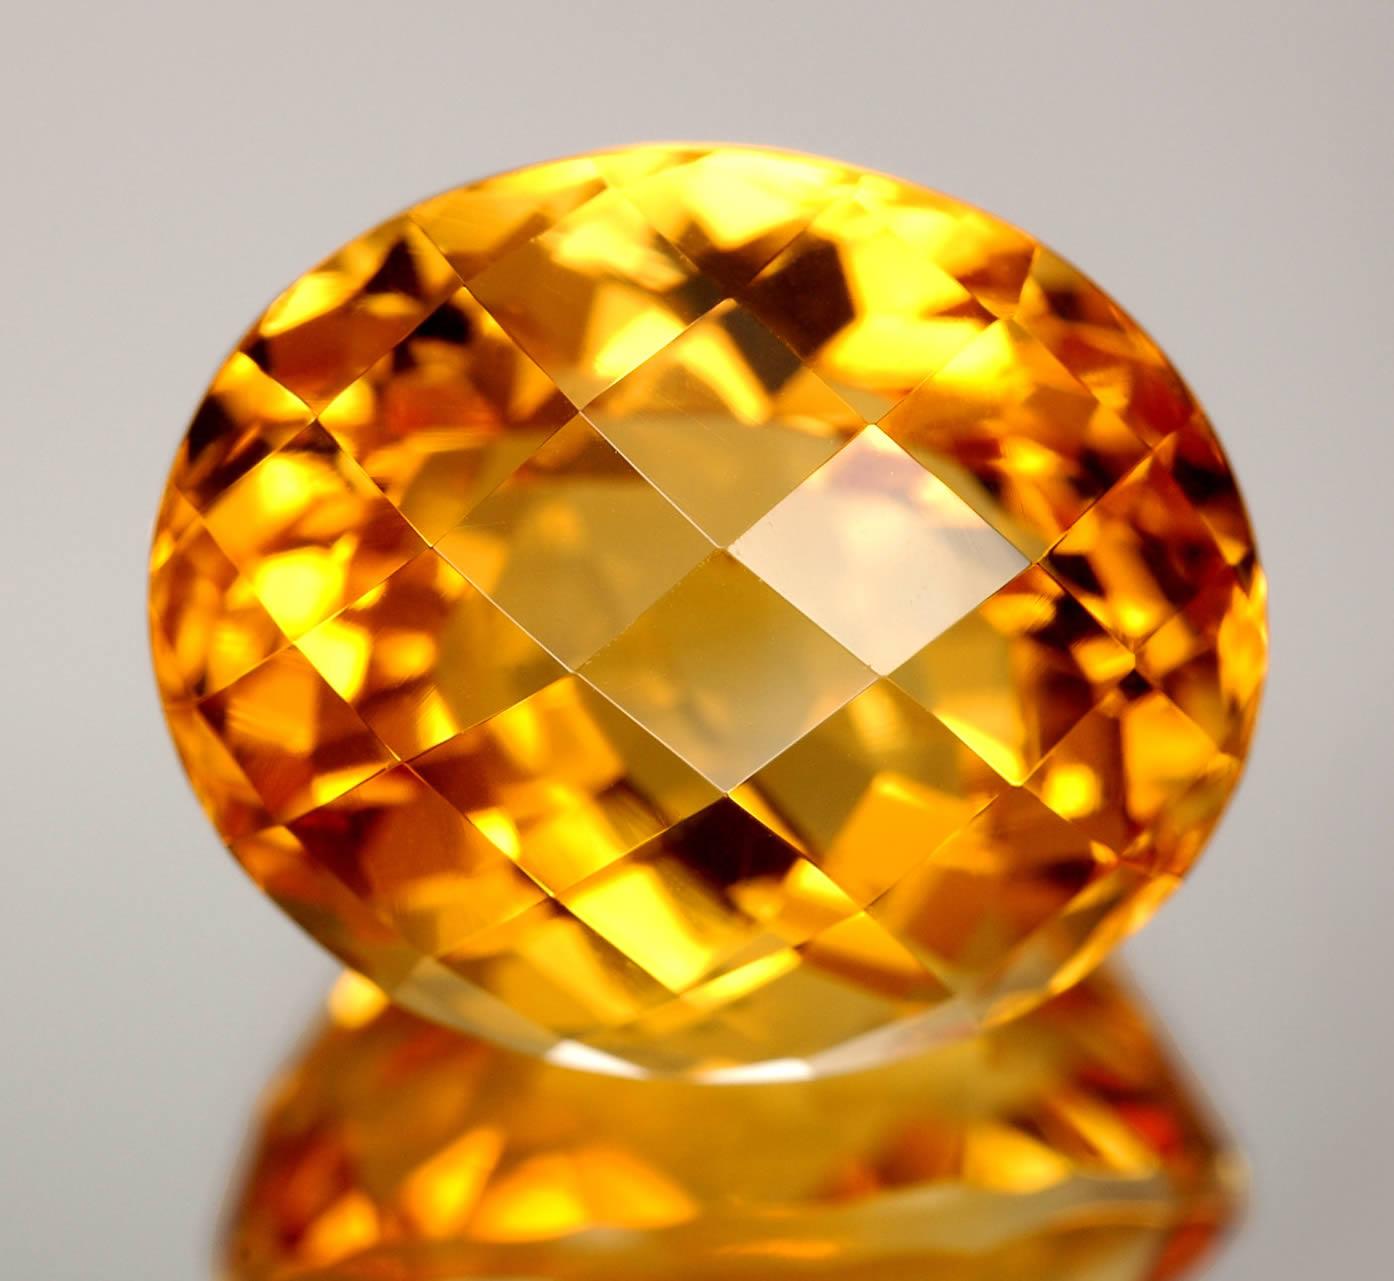 Citrine natural golden citrine gemstone jewelry information citrine natural golden citrine gemstone jewelry information gemselect biocorpaavc Image collections